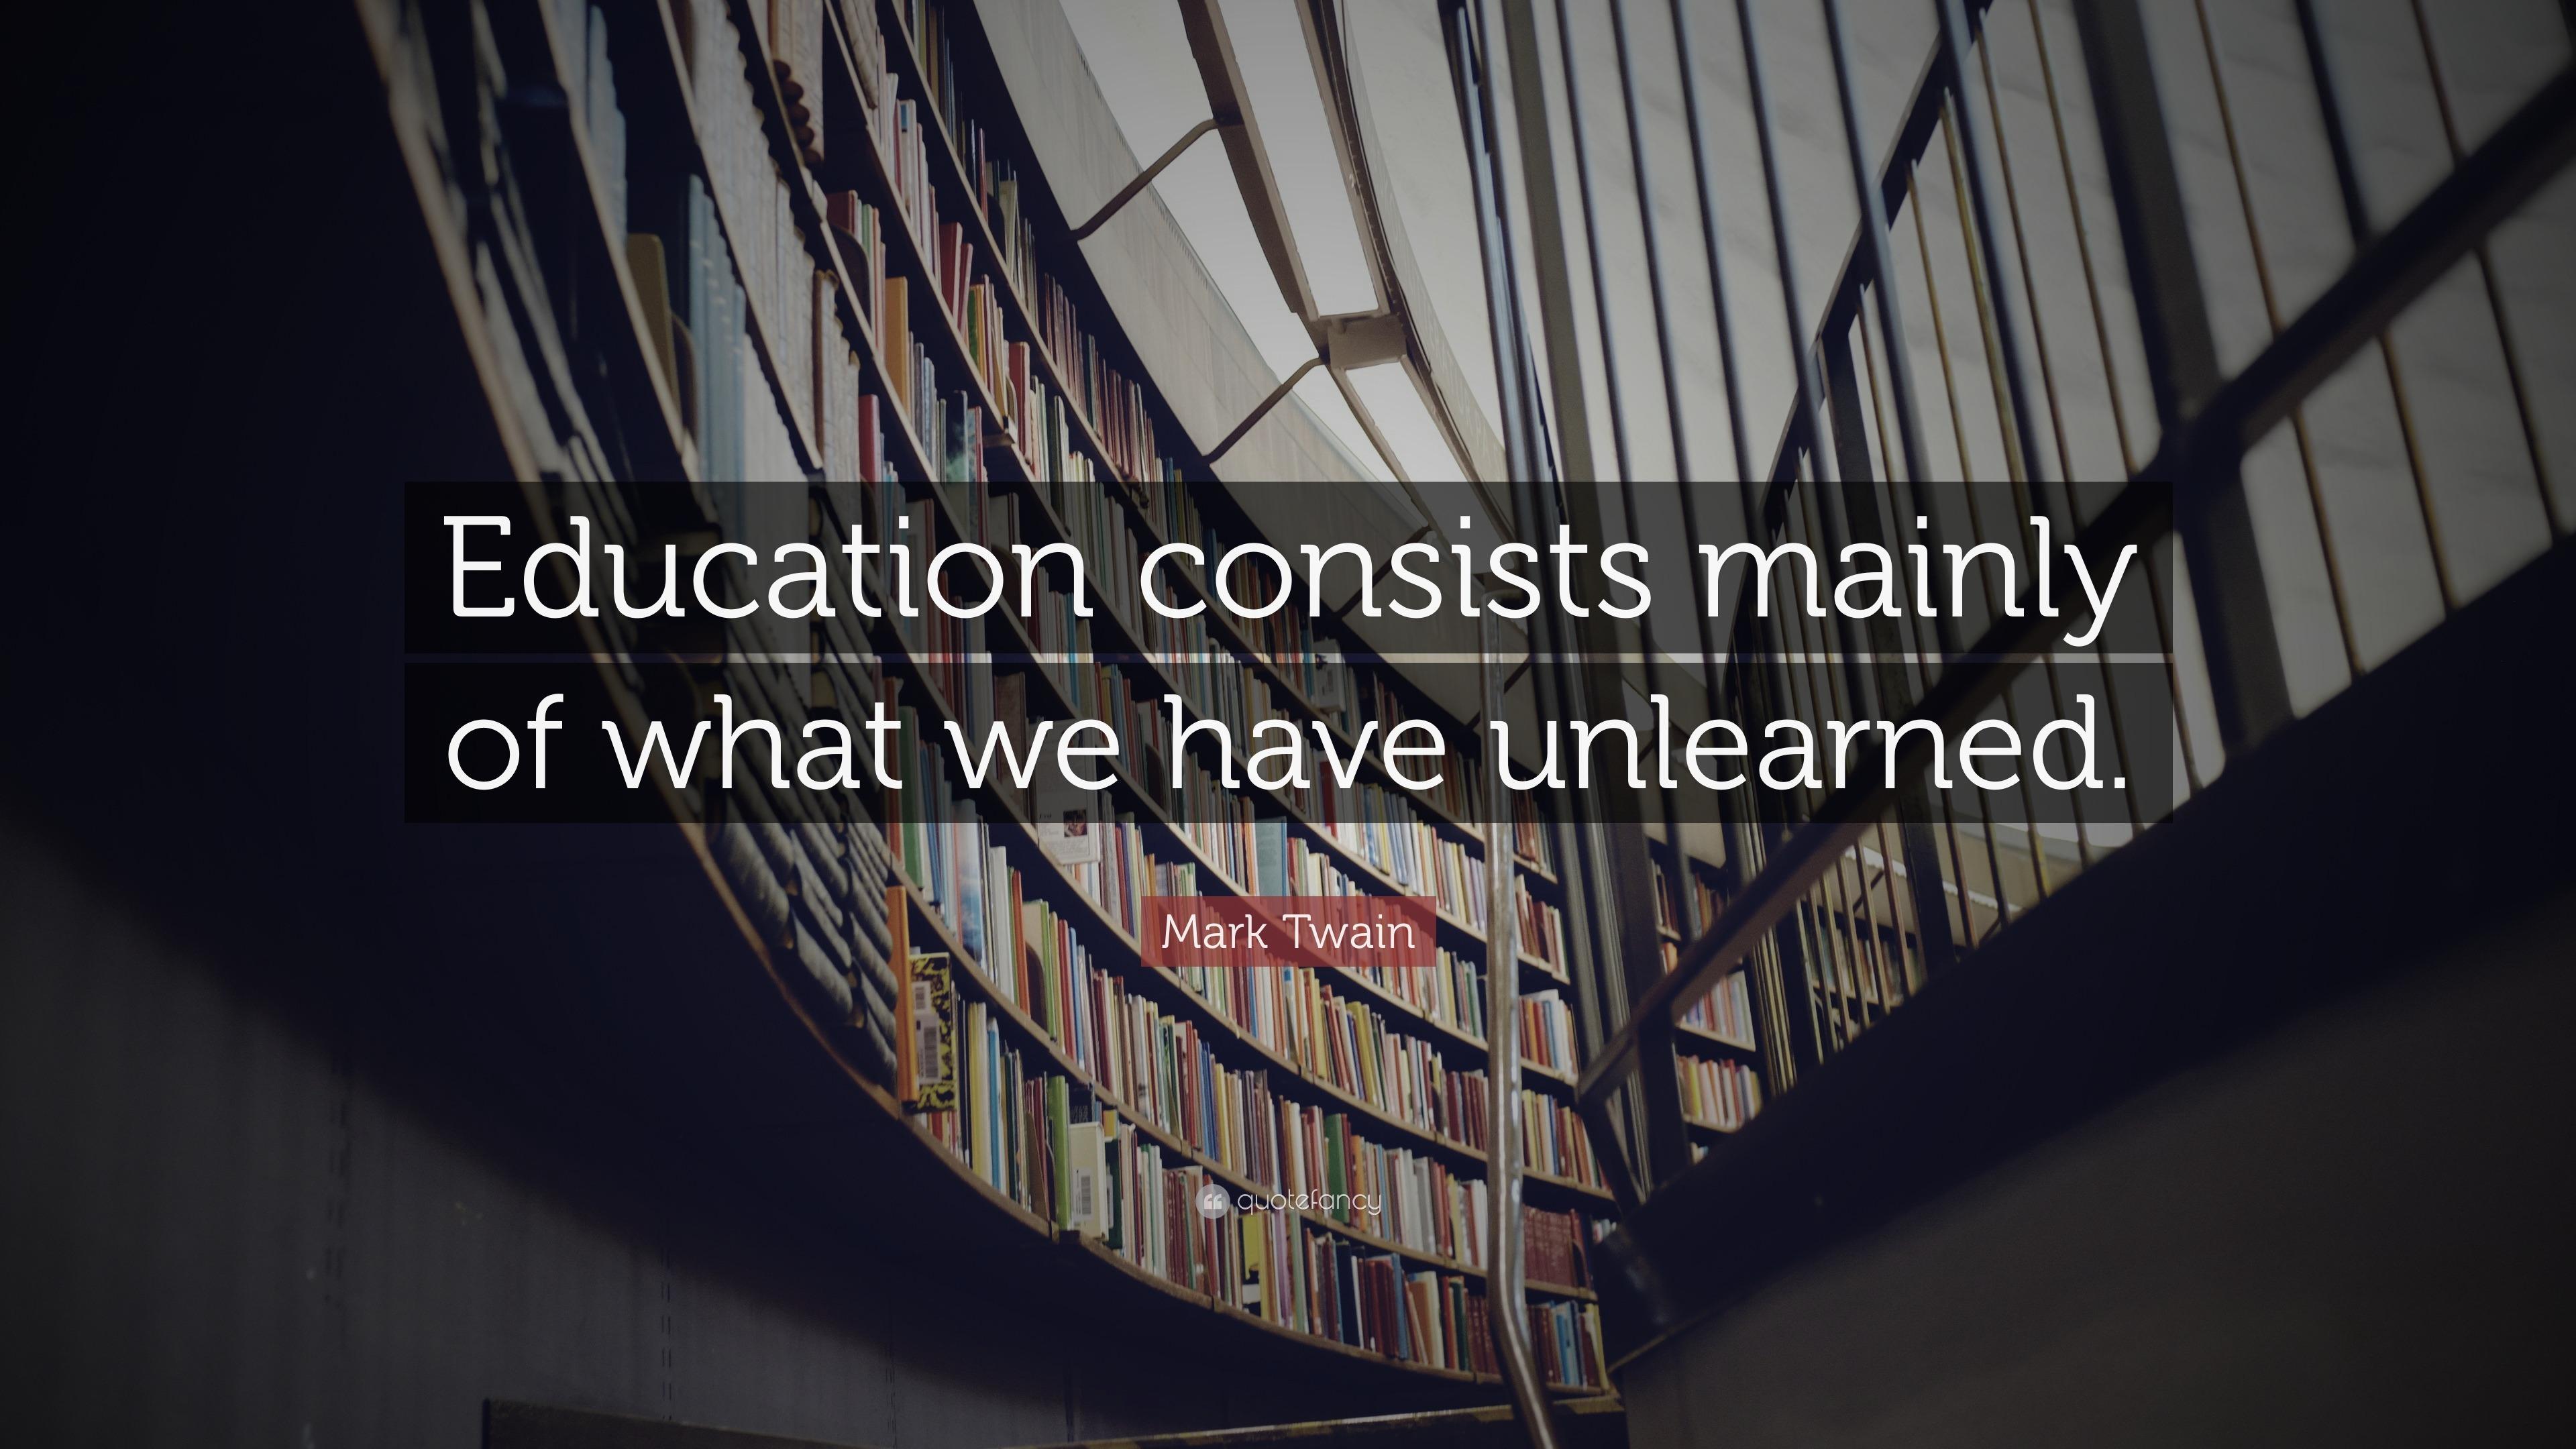 Mark Twain Education Quote